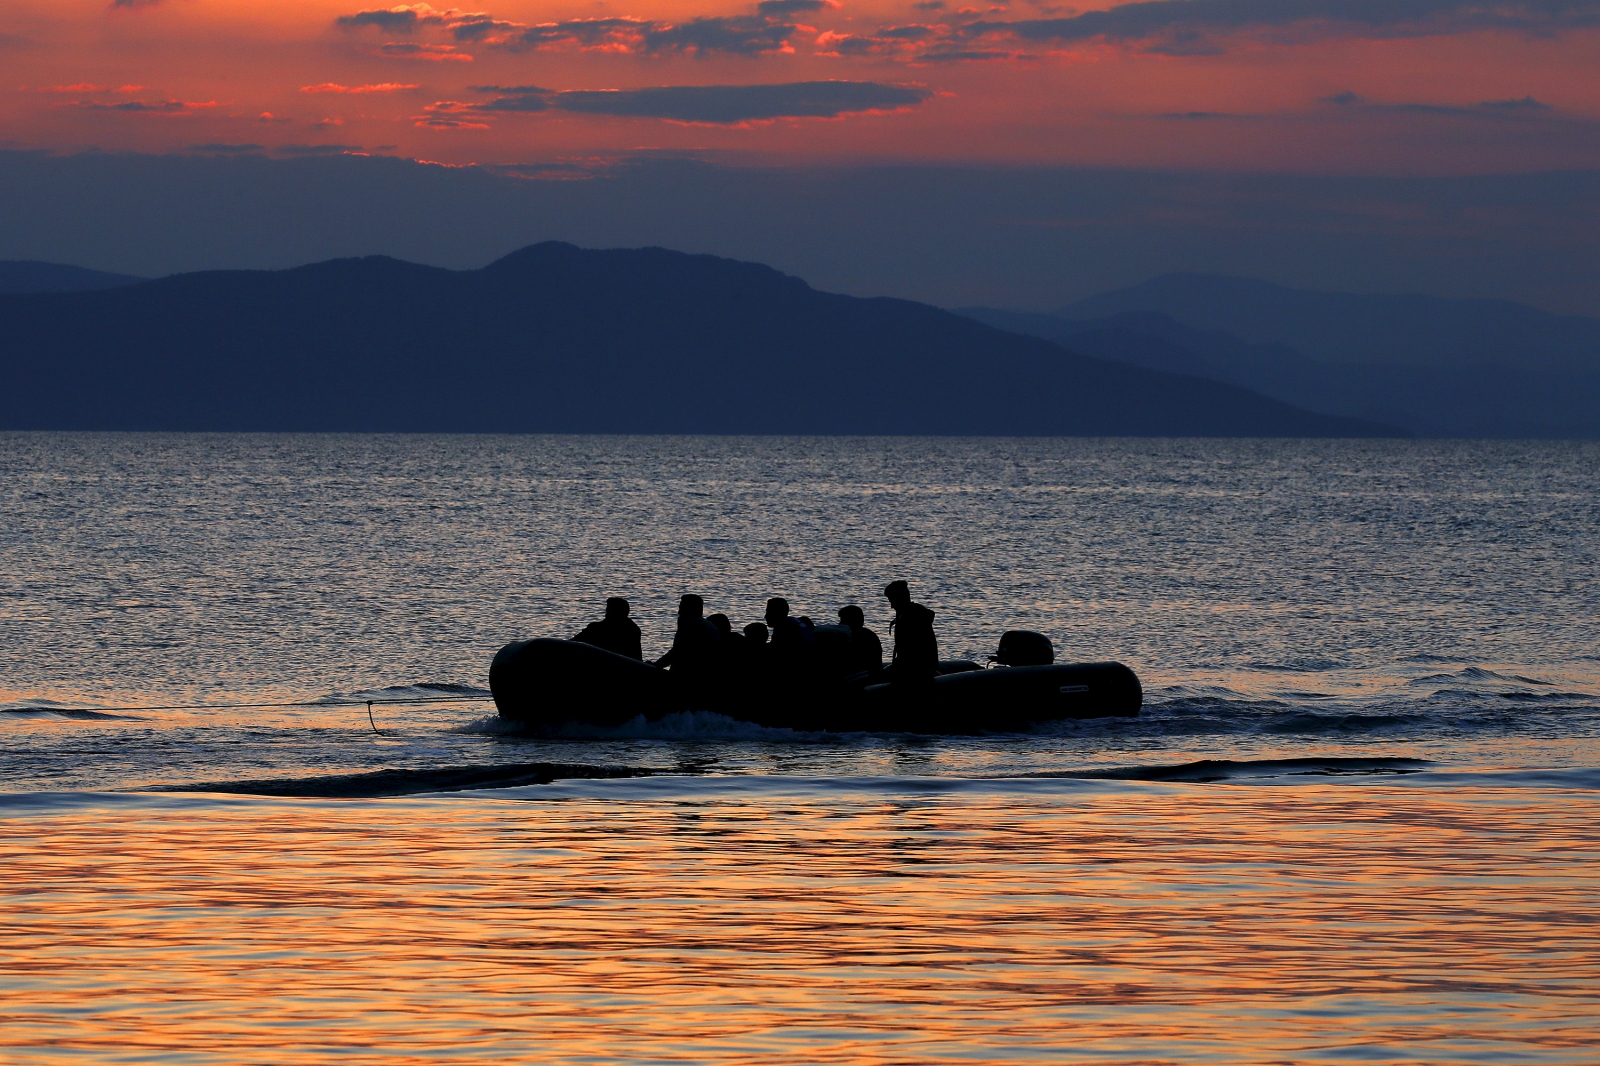 Greece Aegean shipwreck